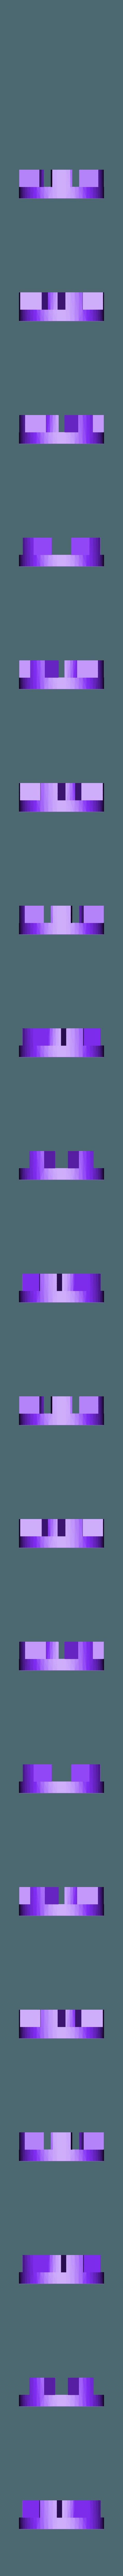 parte parafuso.STL Download STL file mirror support • 3D printer object, Paulocnc